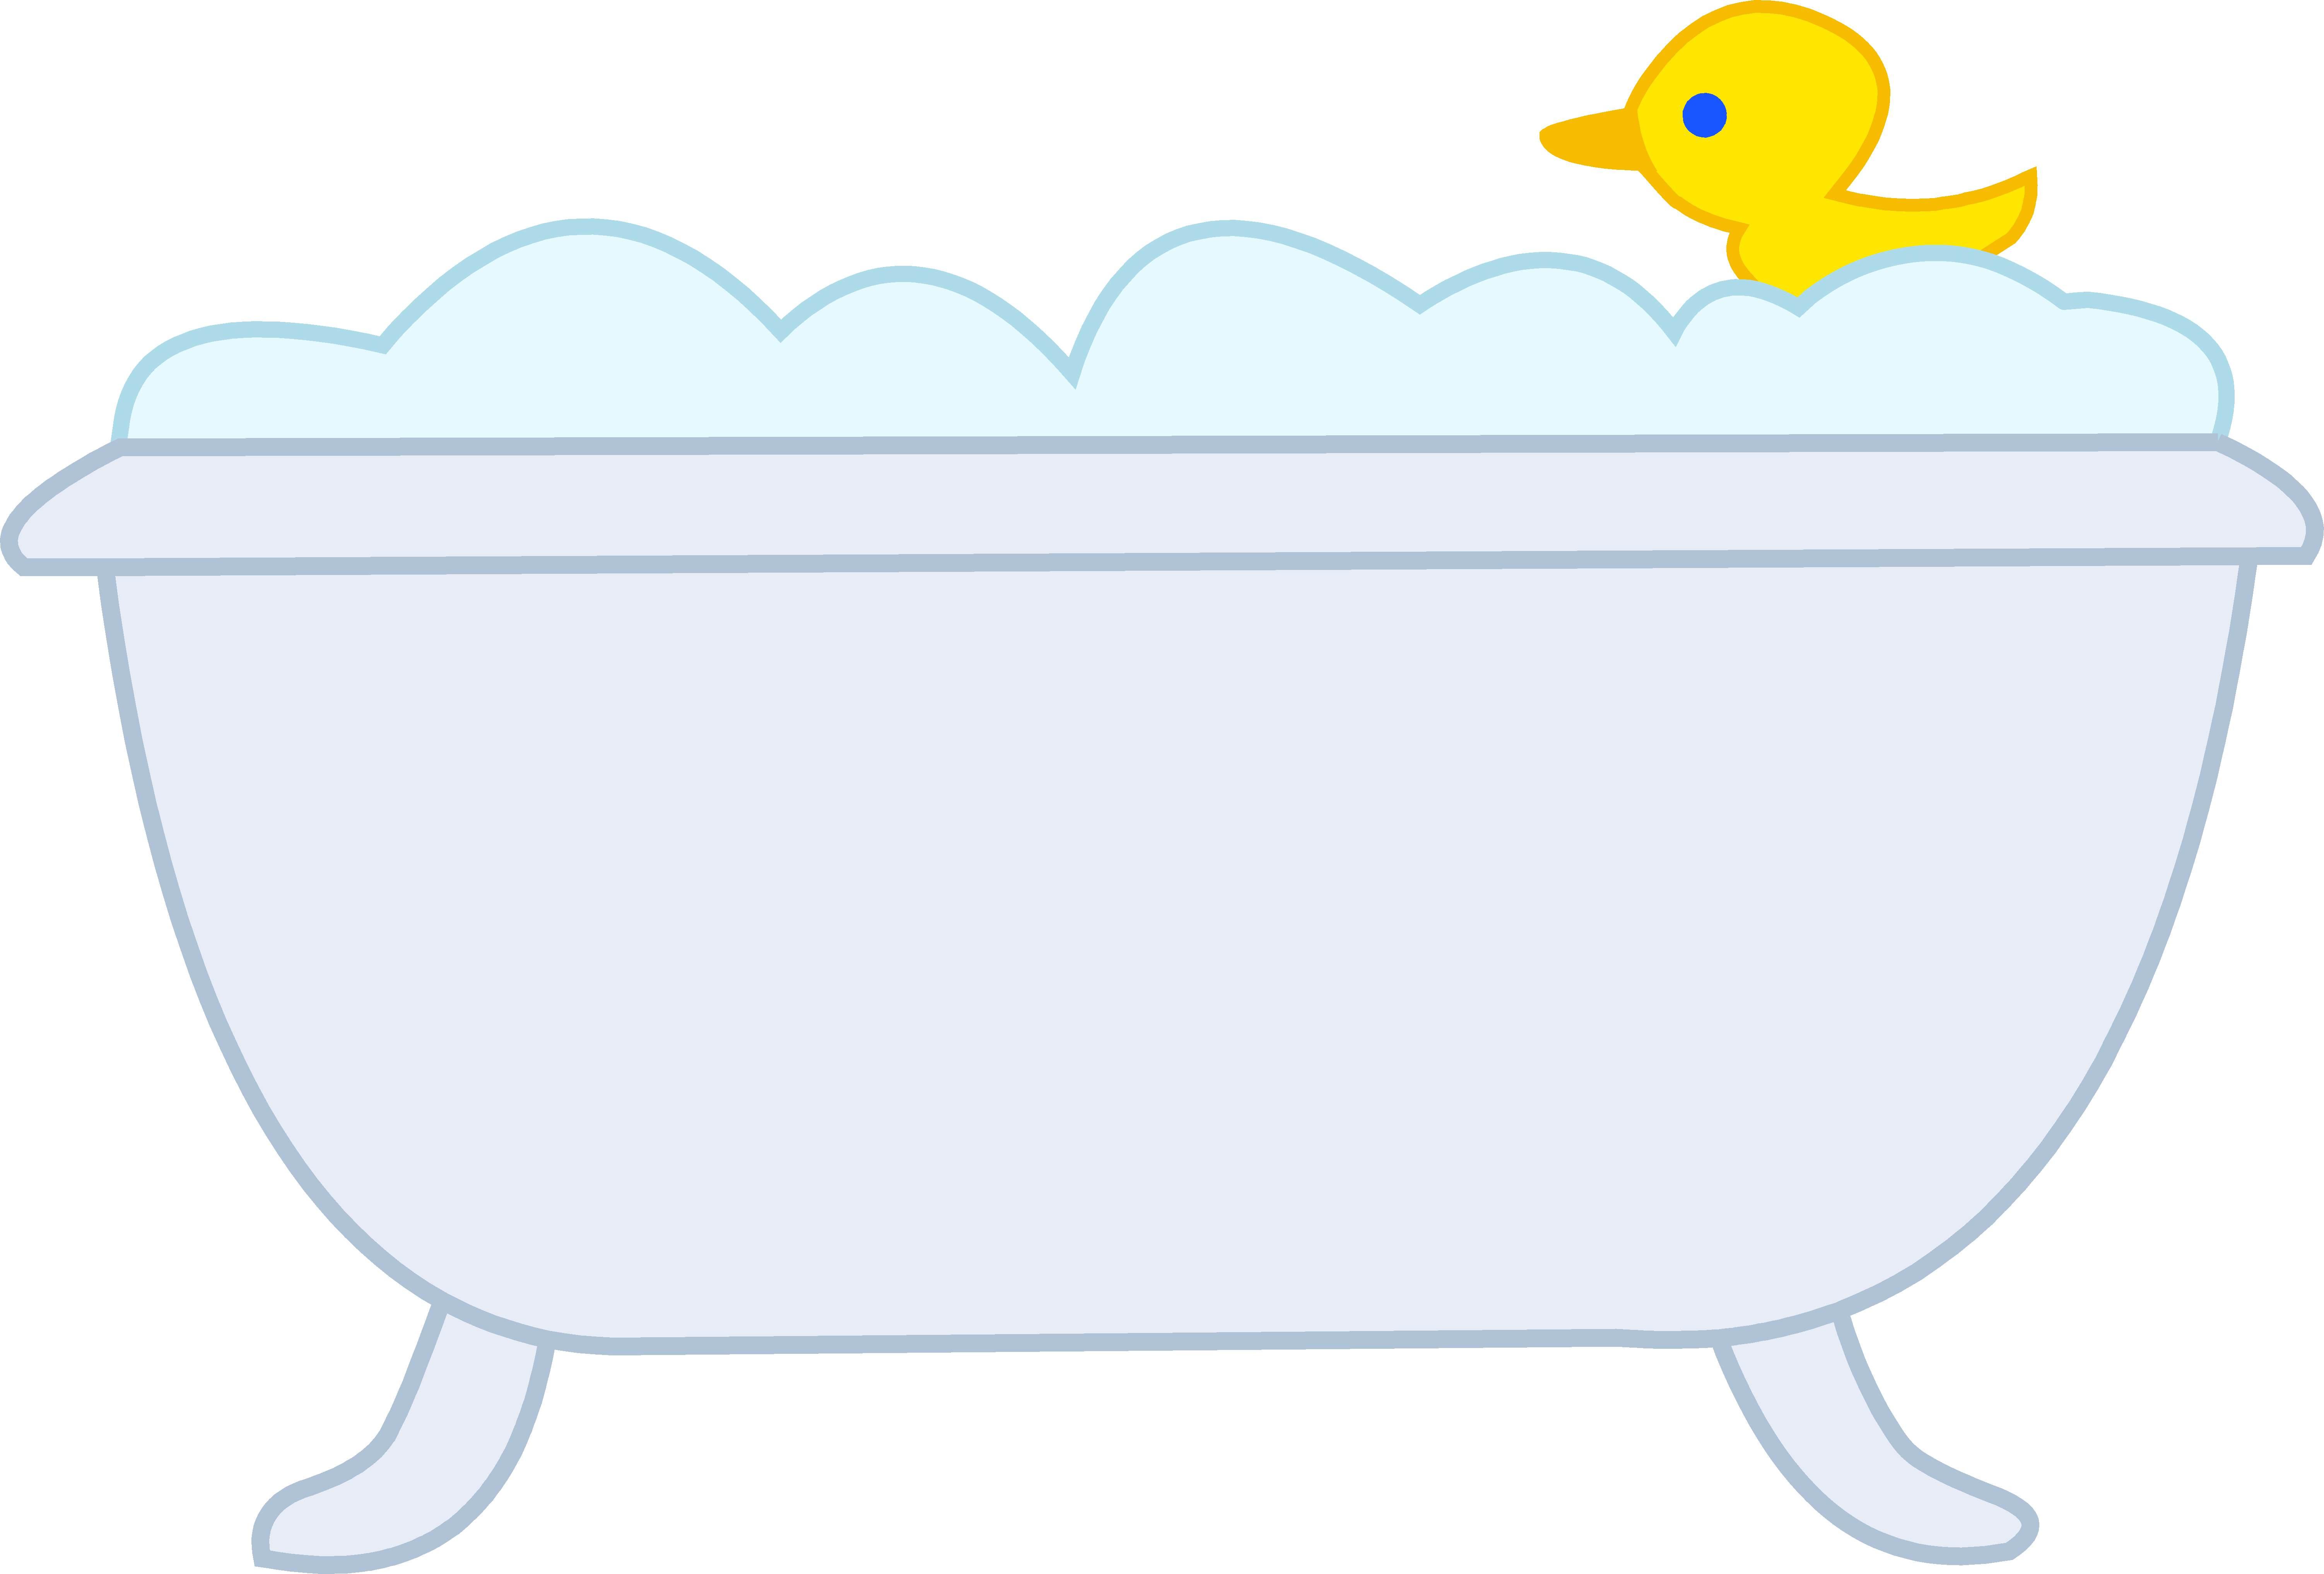 Bathtub Clipart Comic Bathtub Comic Transparent Free For Download On Webstockreview 2020